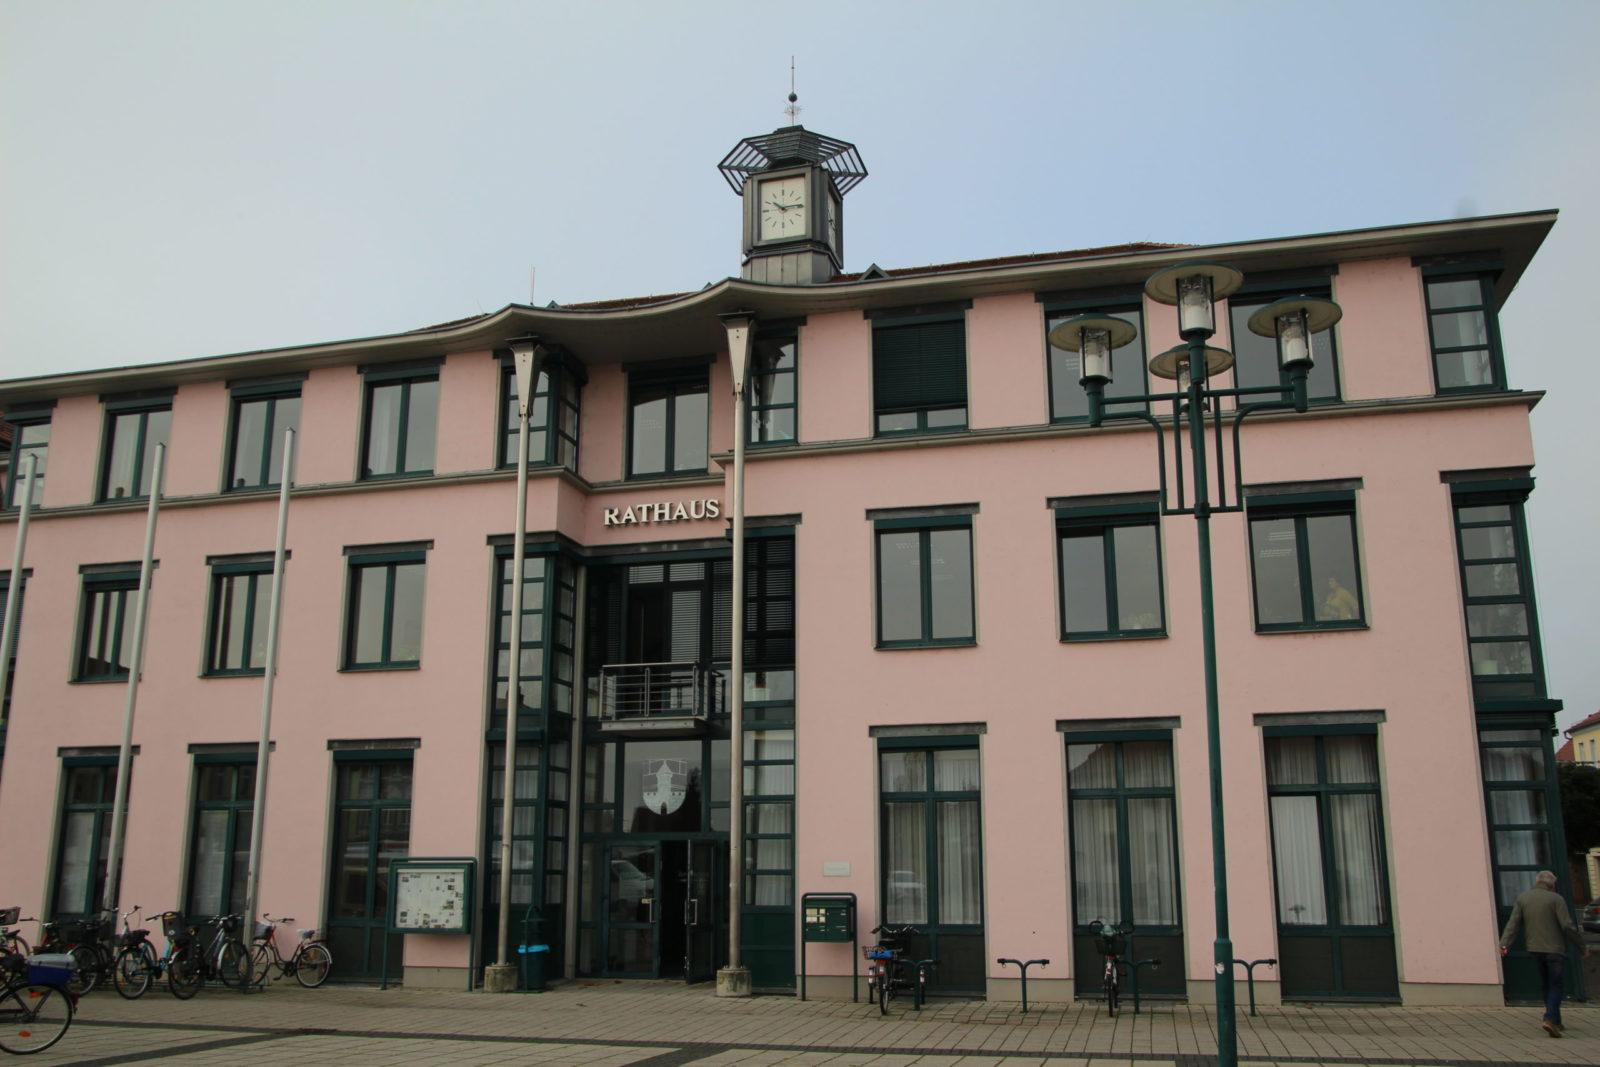 Parthelandhalle Naunhof